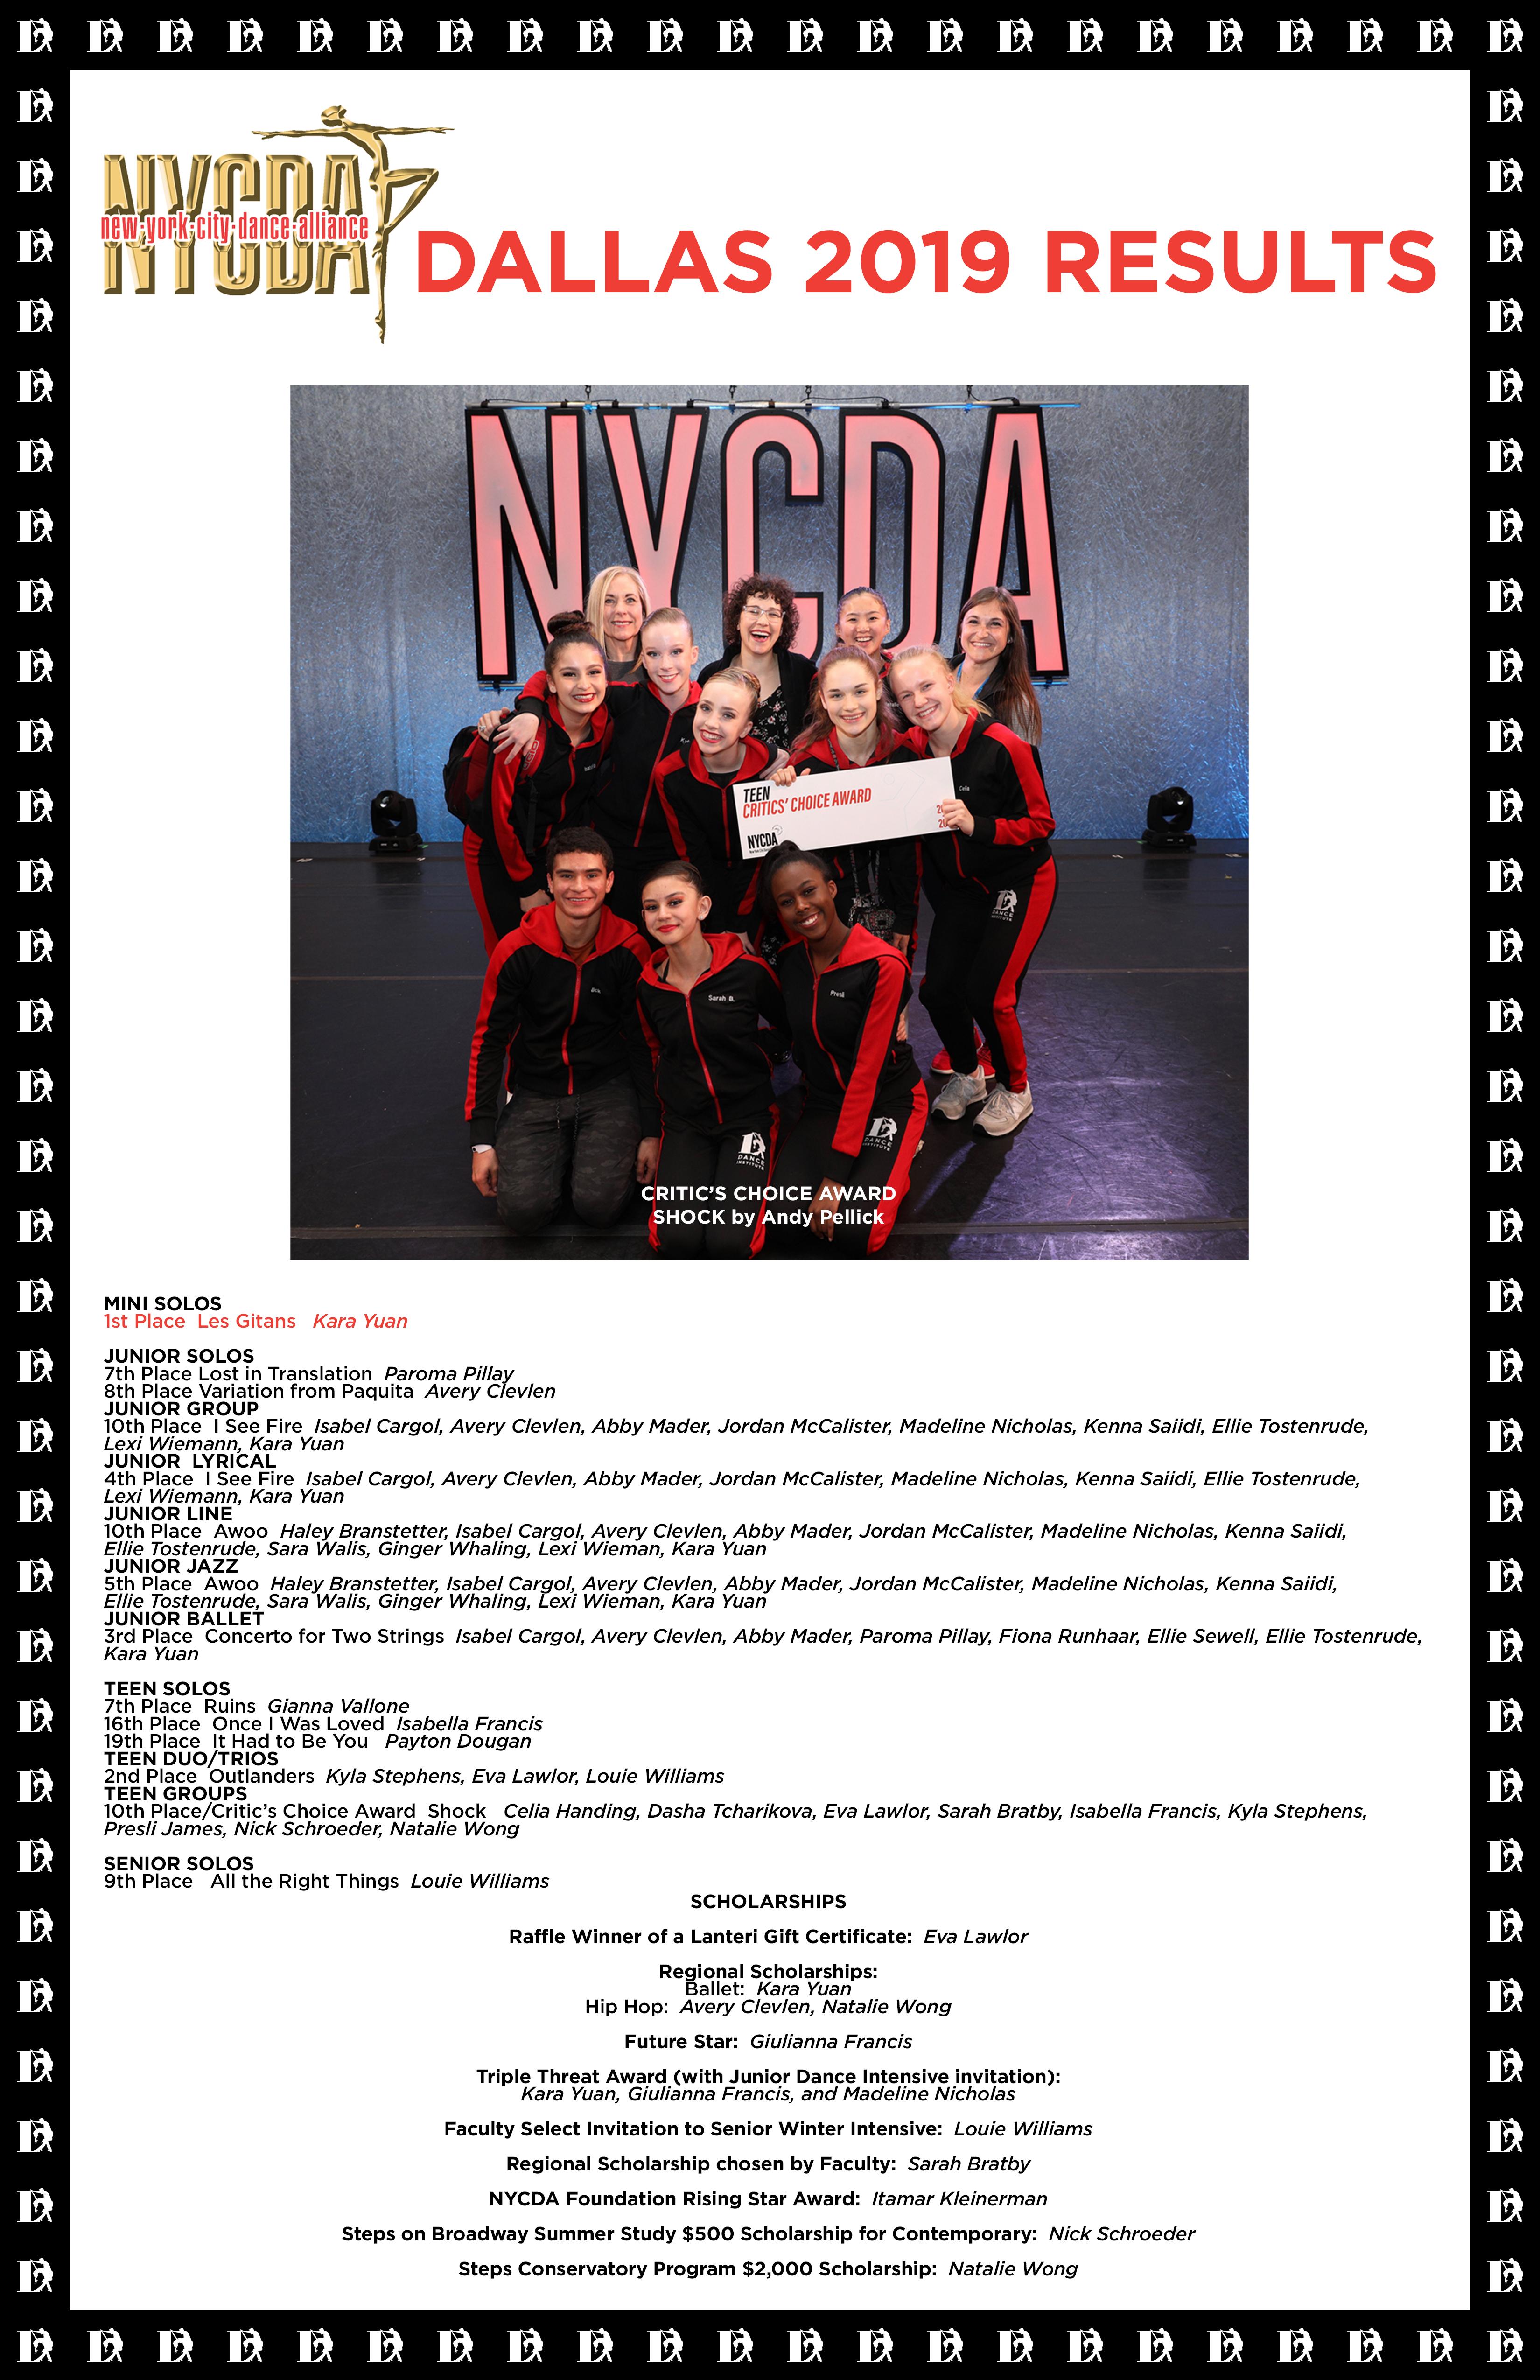 NYCDA 2019 Results(1)